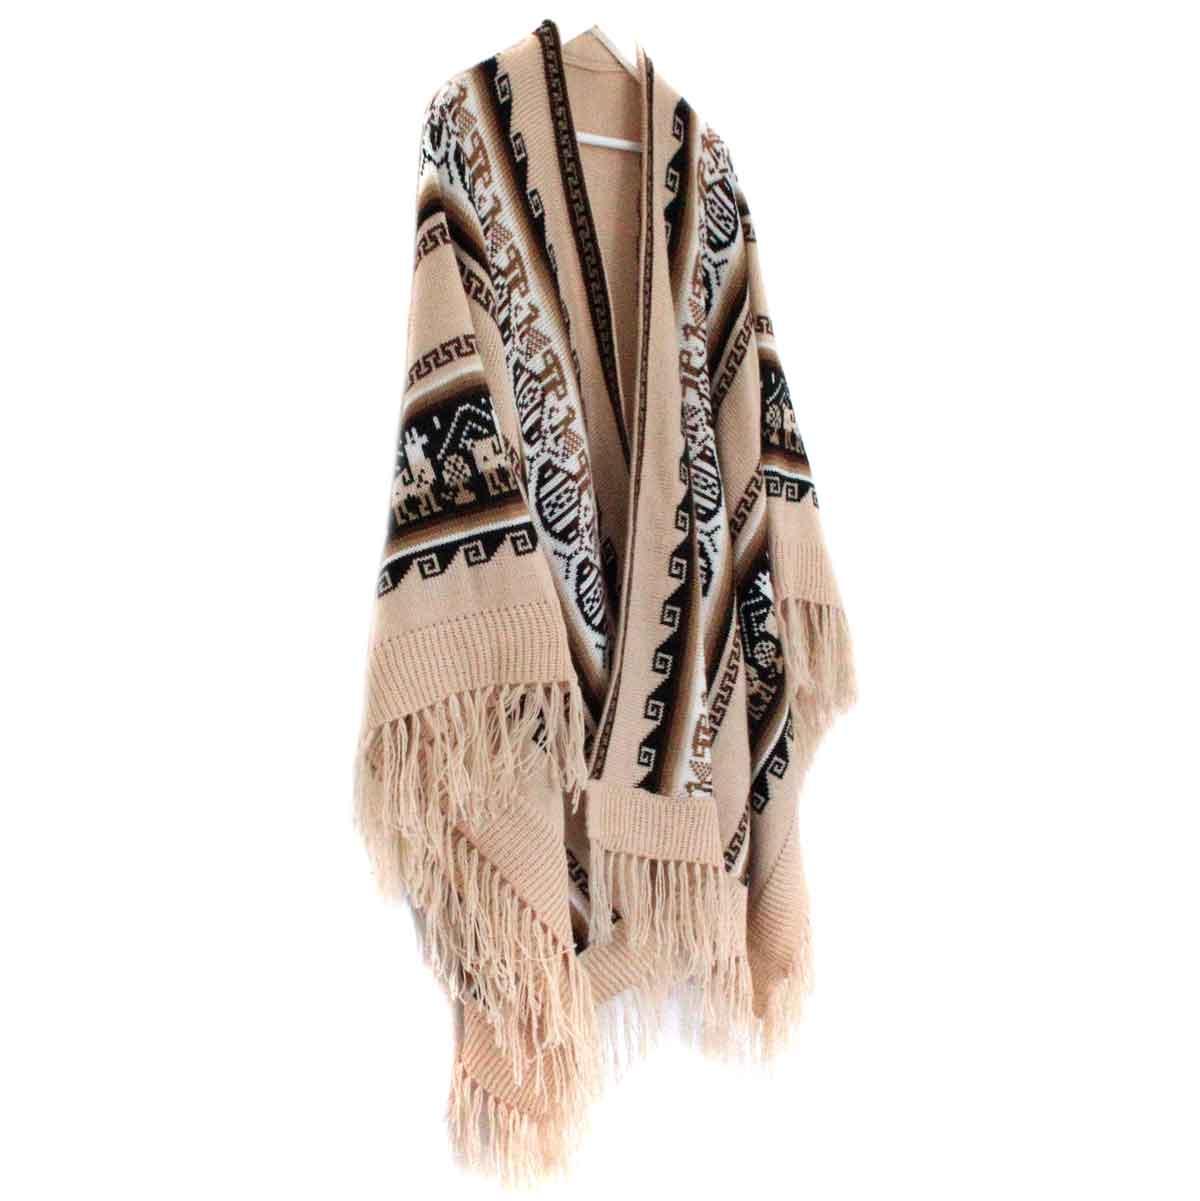 Inka-Products-Poncho Alpaga JAYWAY-Beige Crème Motifs Ethniques-2